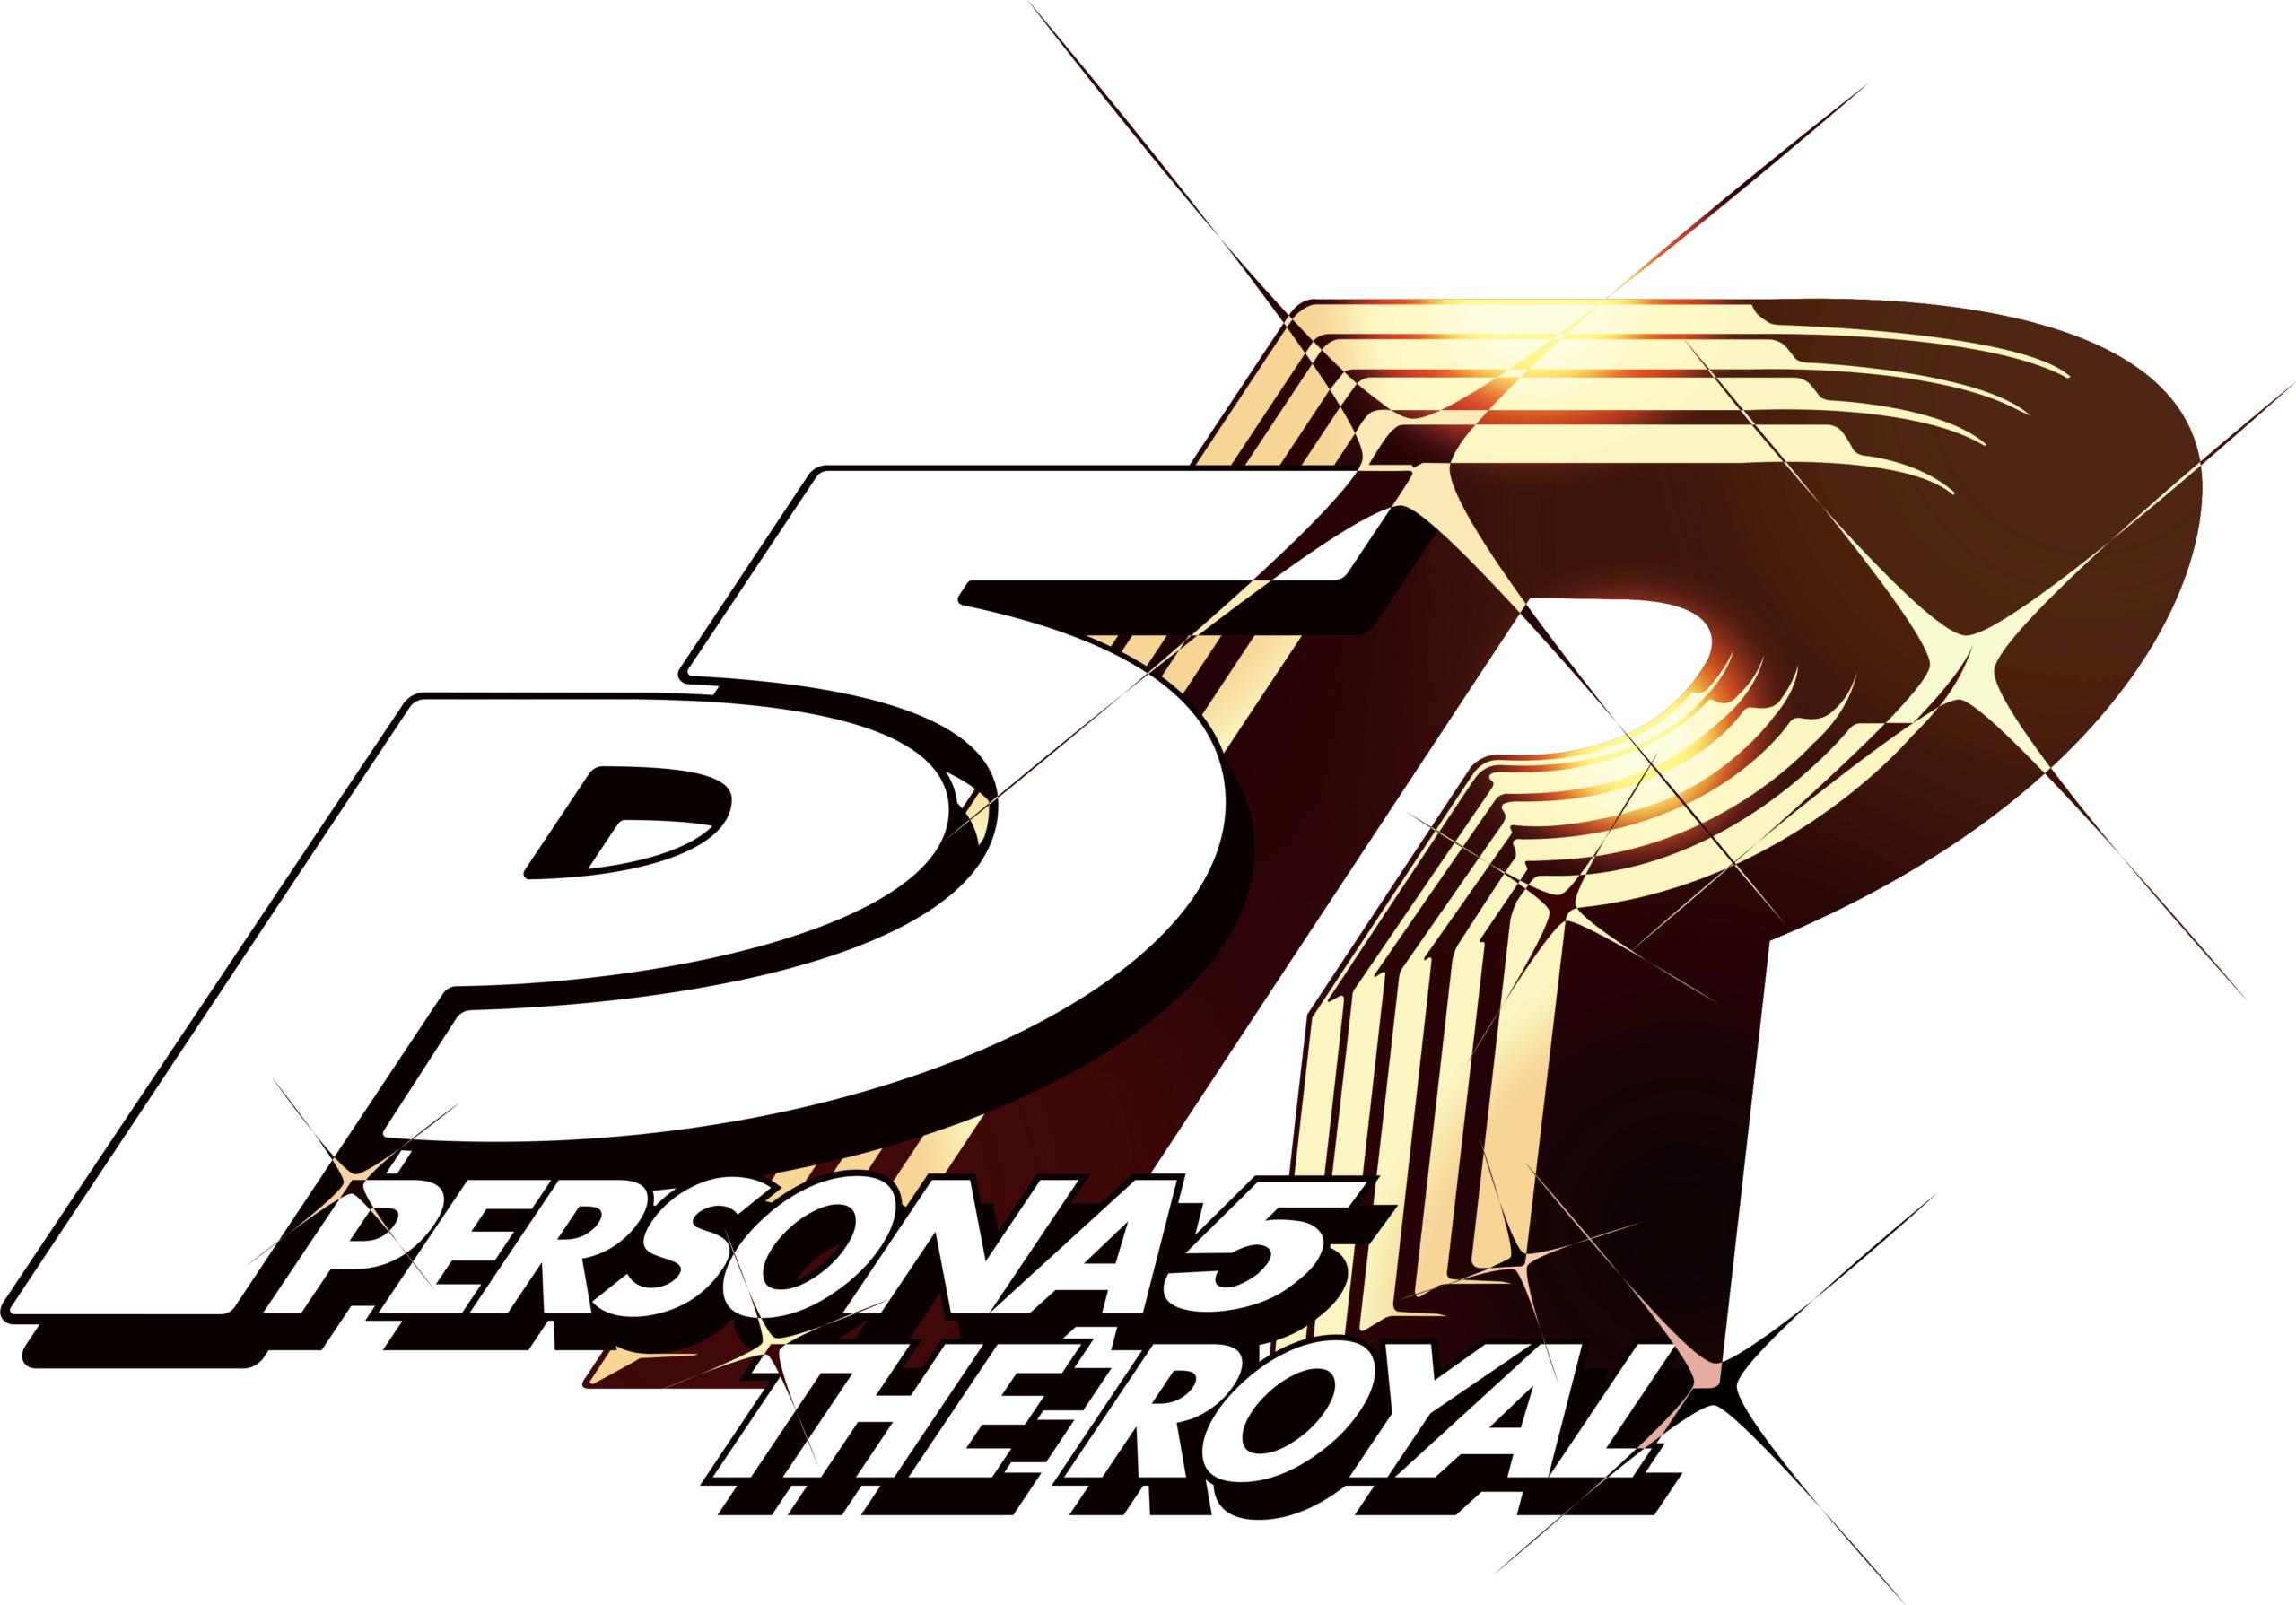 眾望所歸的心之怪盜將於PERSONA 5 THE ROYAL回歸 『PERSONA 5 THE ROYAL』將於2020年推出繁體中文版! P5r_lo10